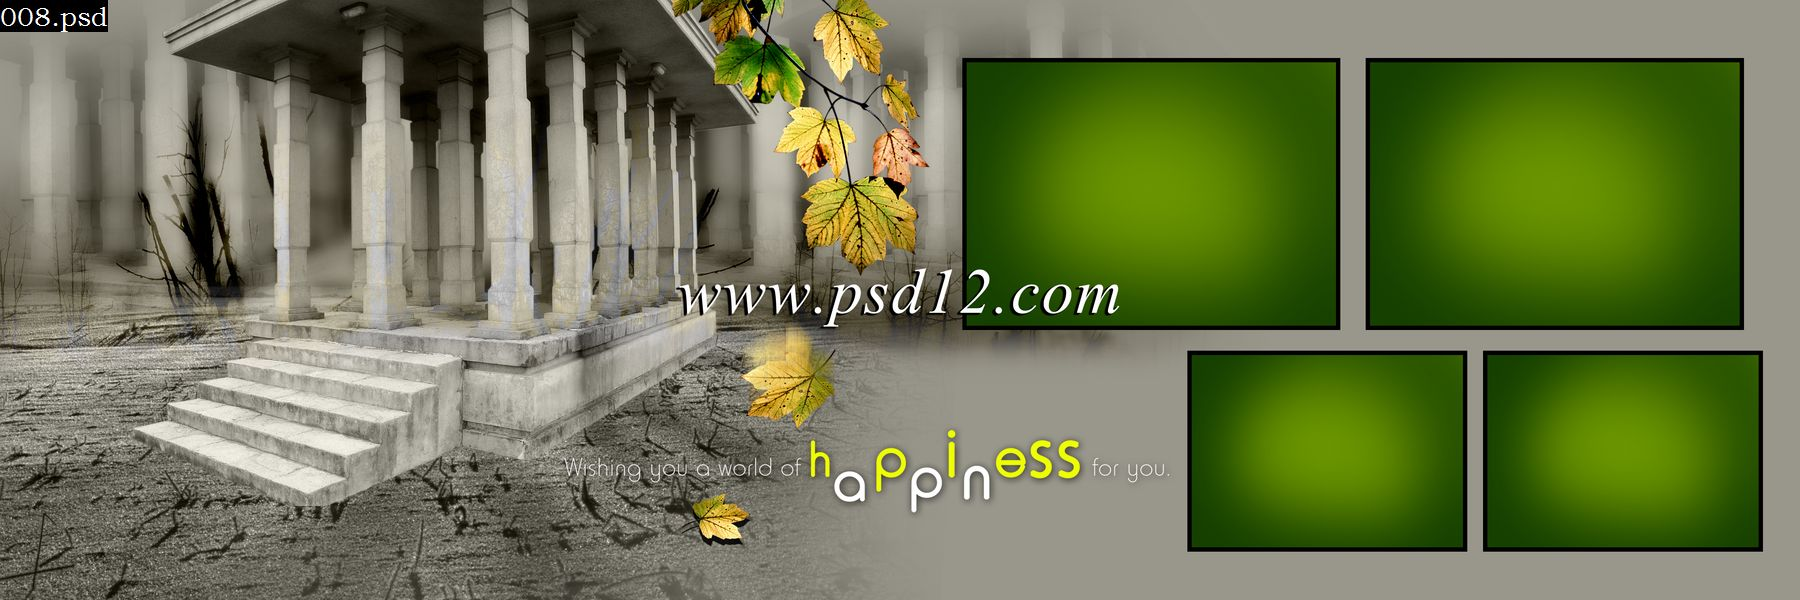 Karisma Album Photo Album PSD files